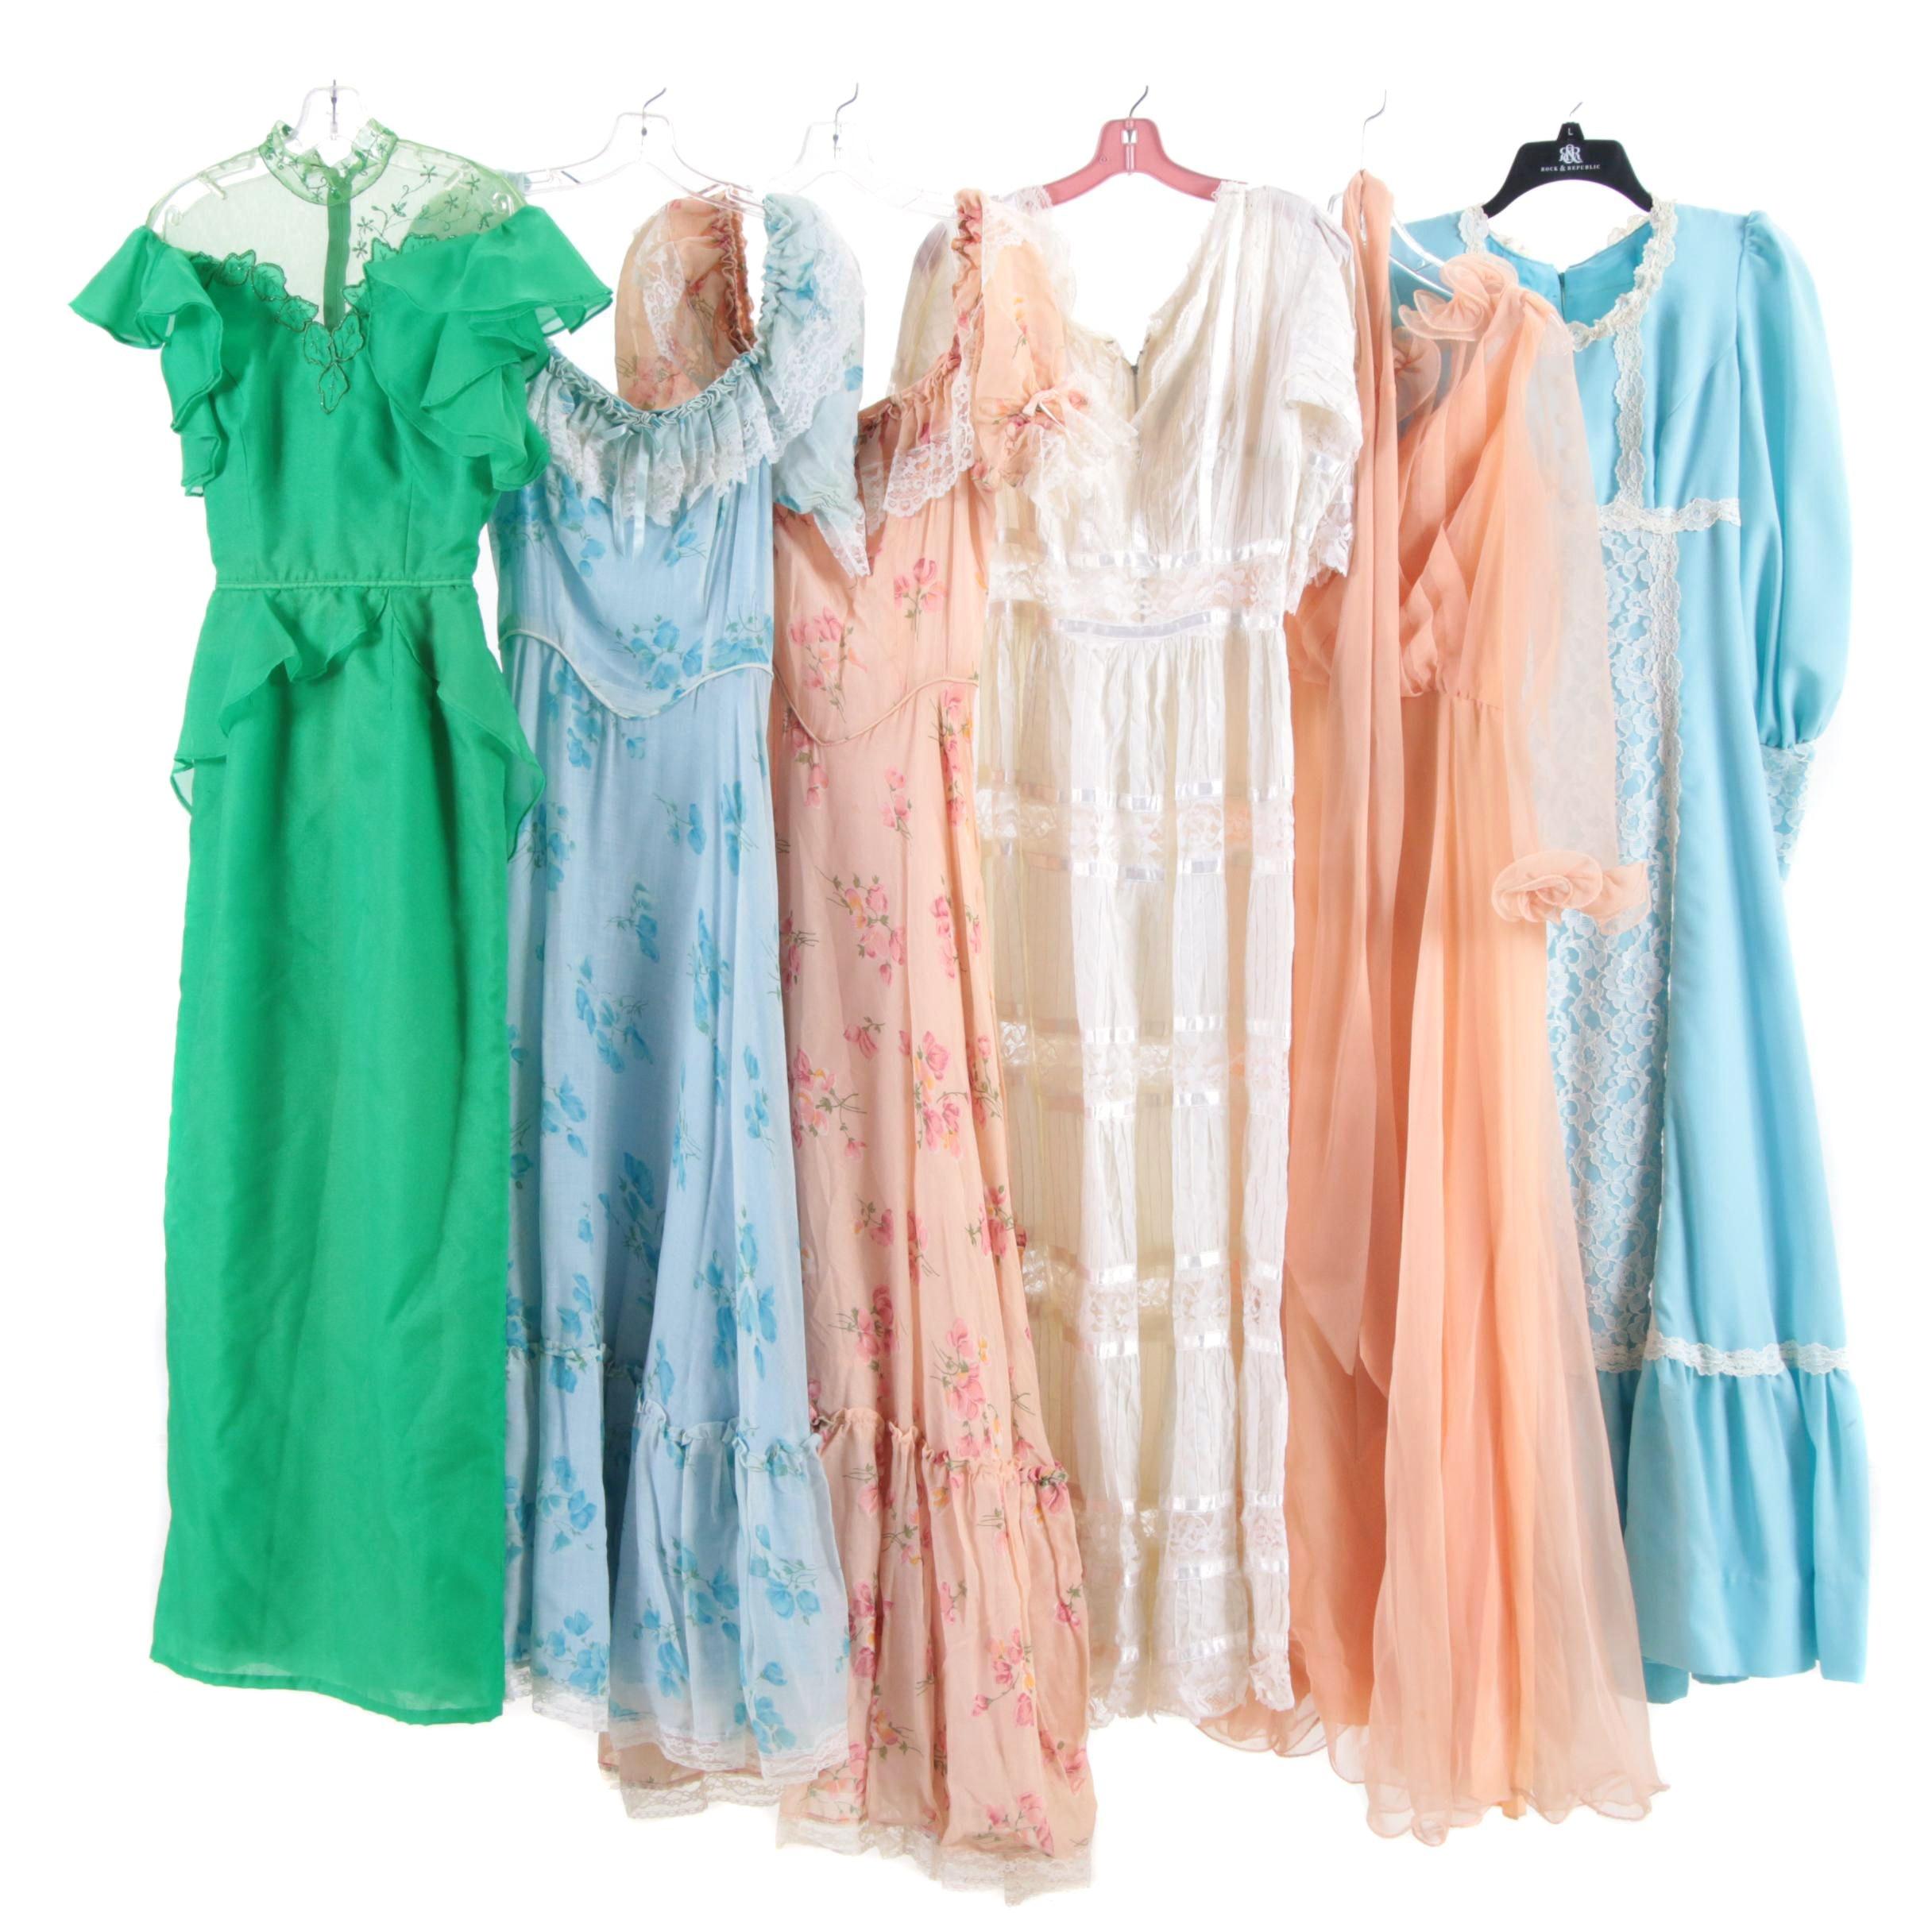 Dresses Including Miss Elliette California, 1970s Vintage